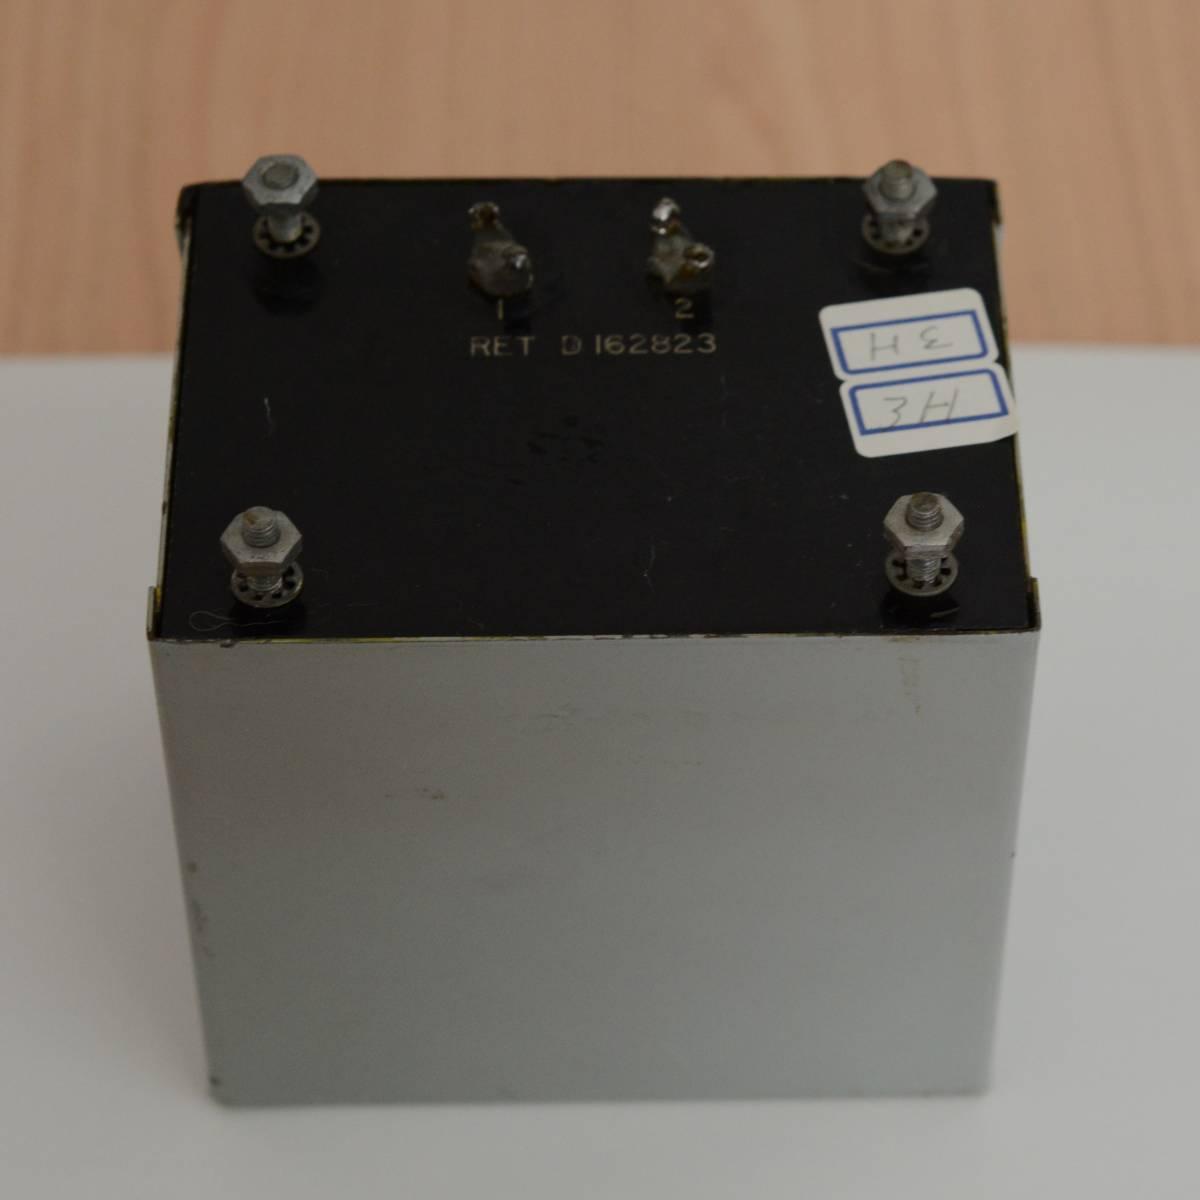 Western Electric ウエスタンエレクトリック チョ-ク D162823 3H_画像3